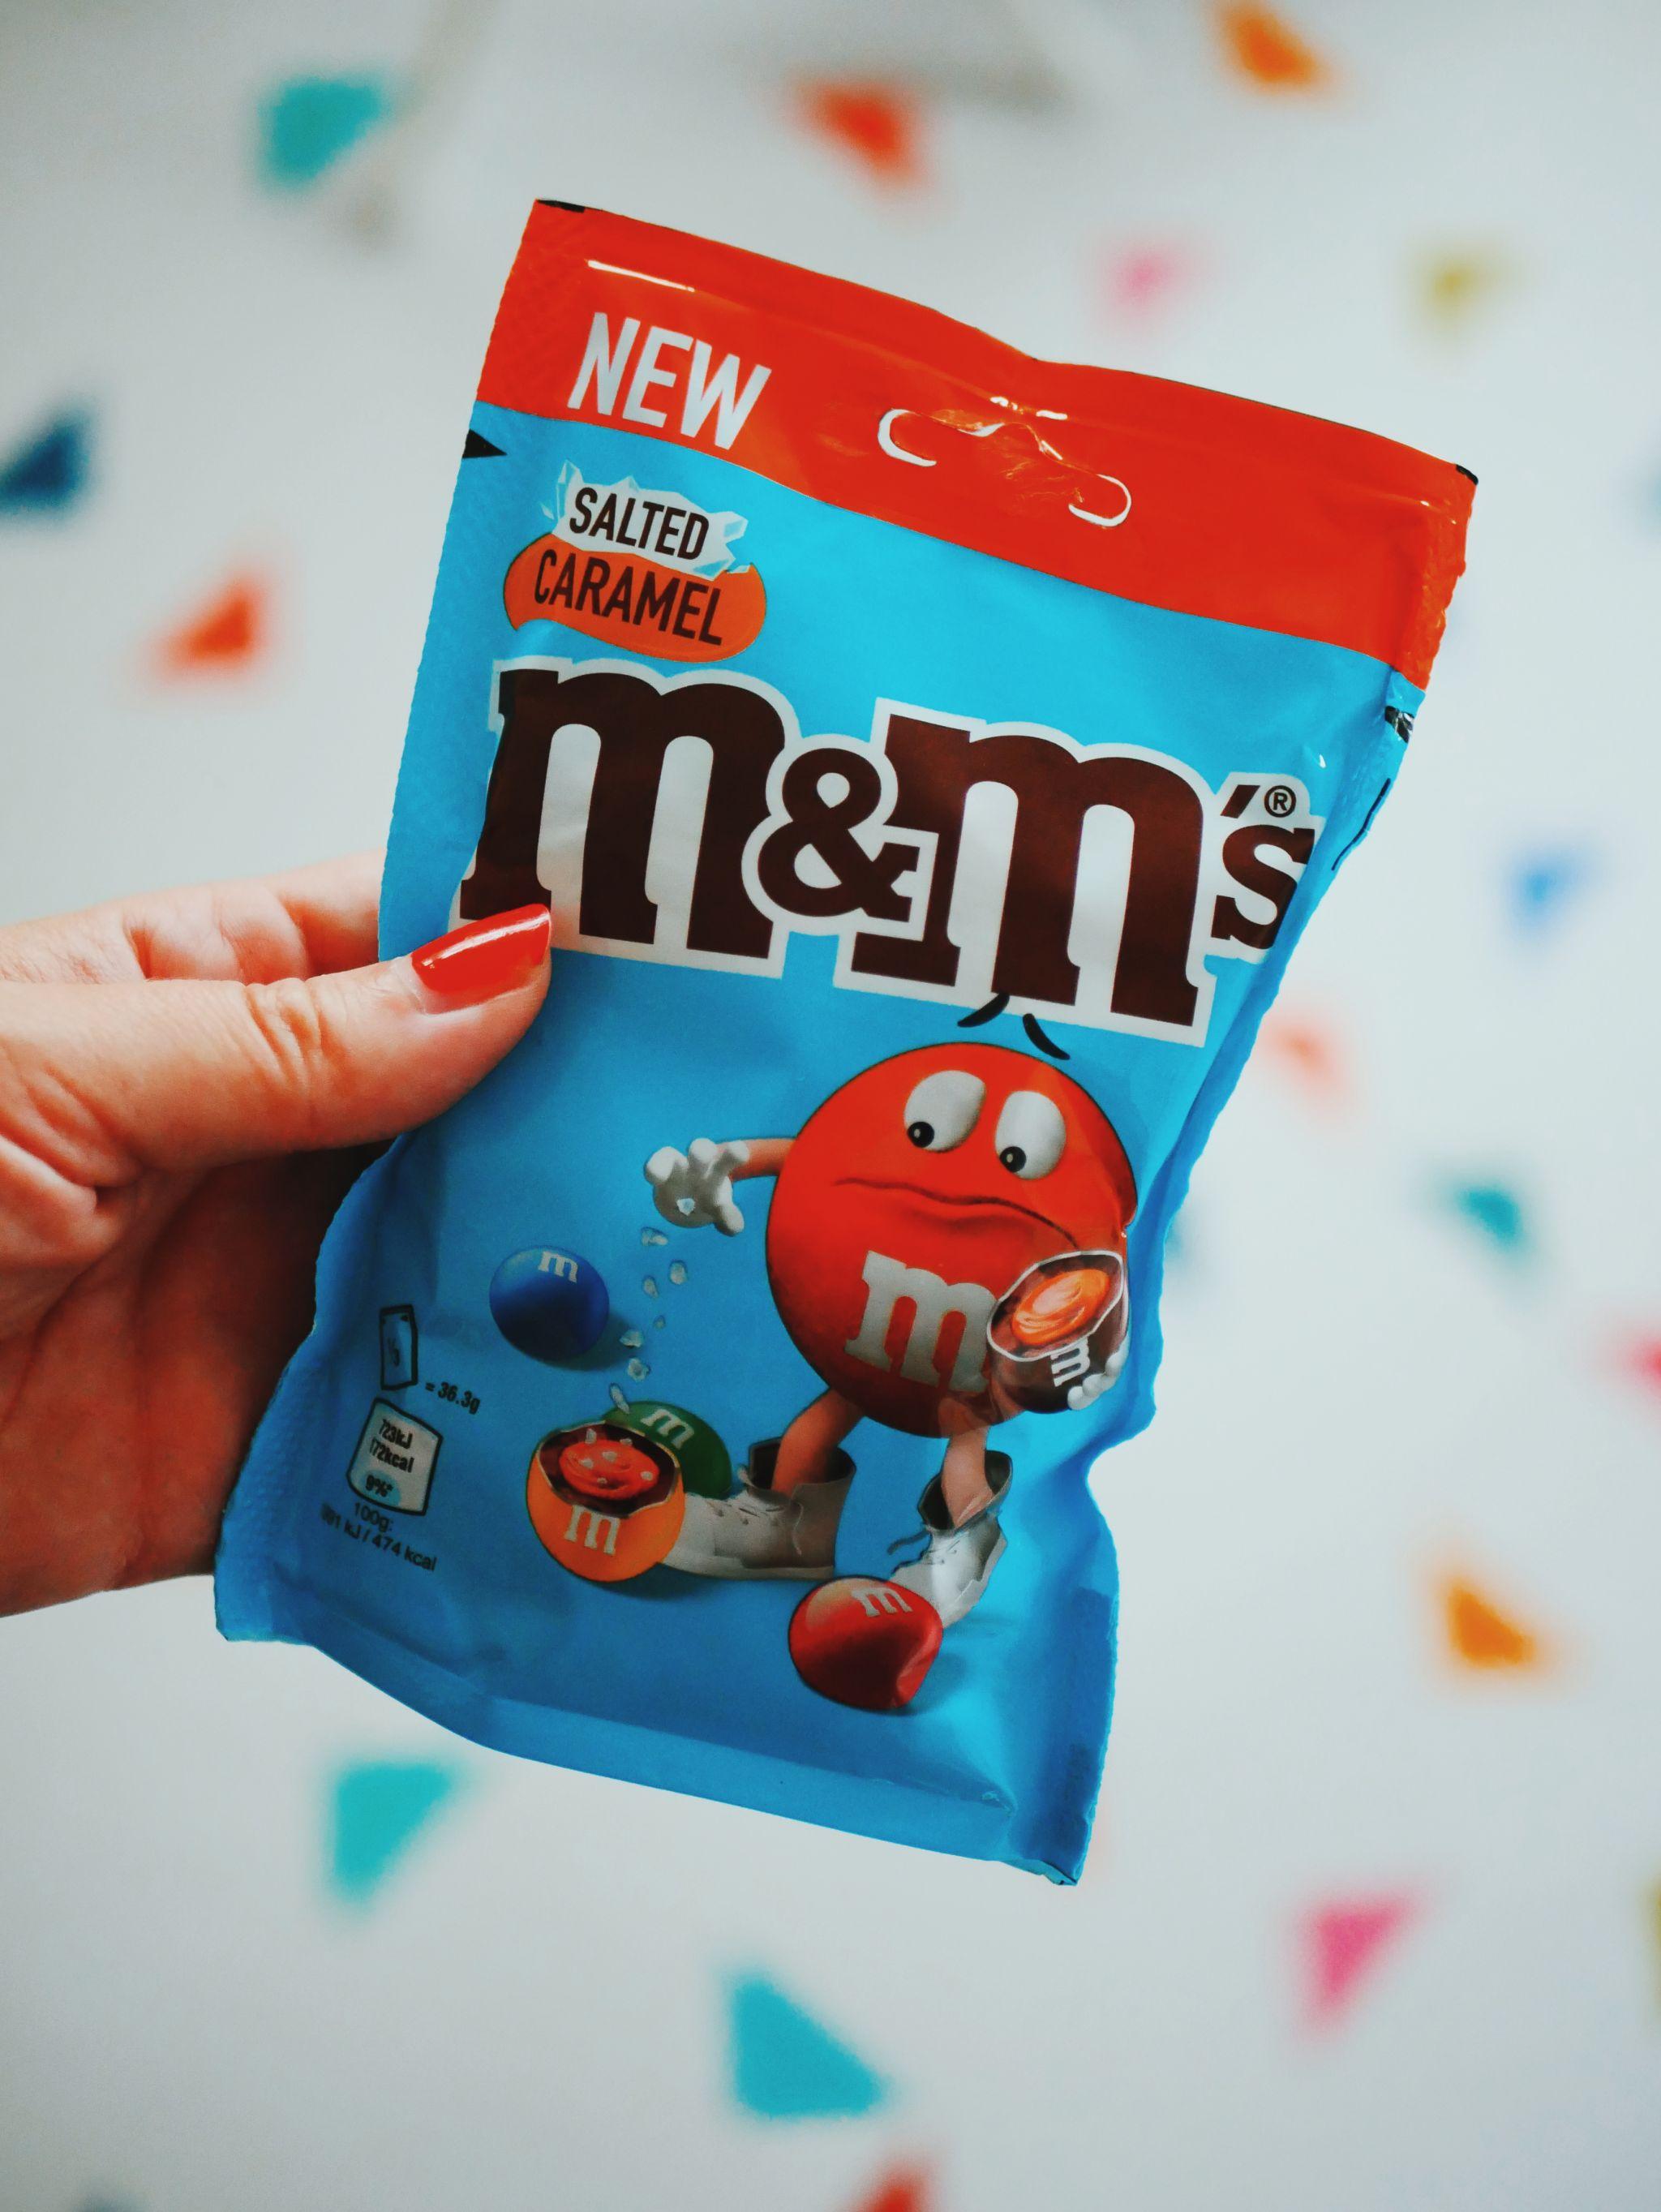 m&m limited edited salted caramel